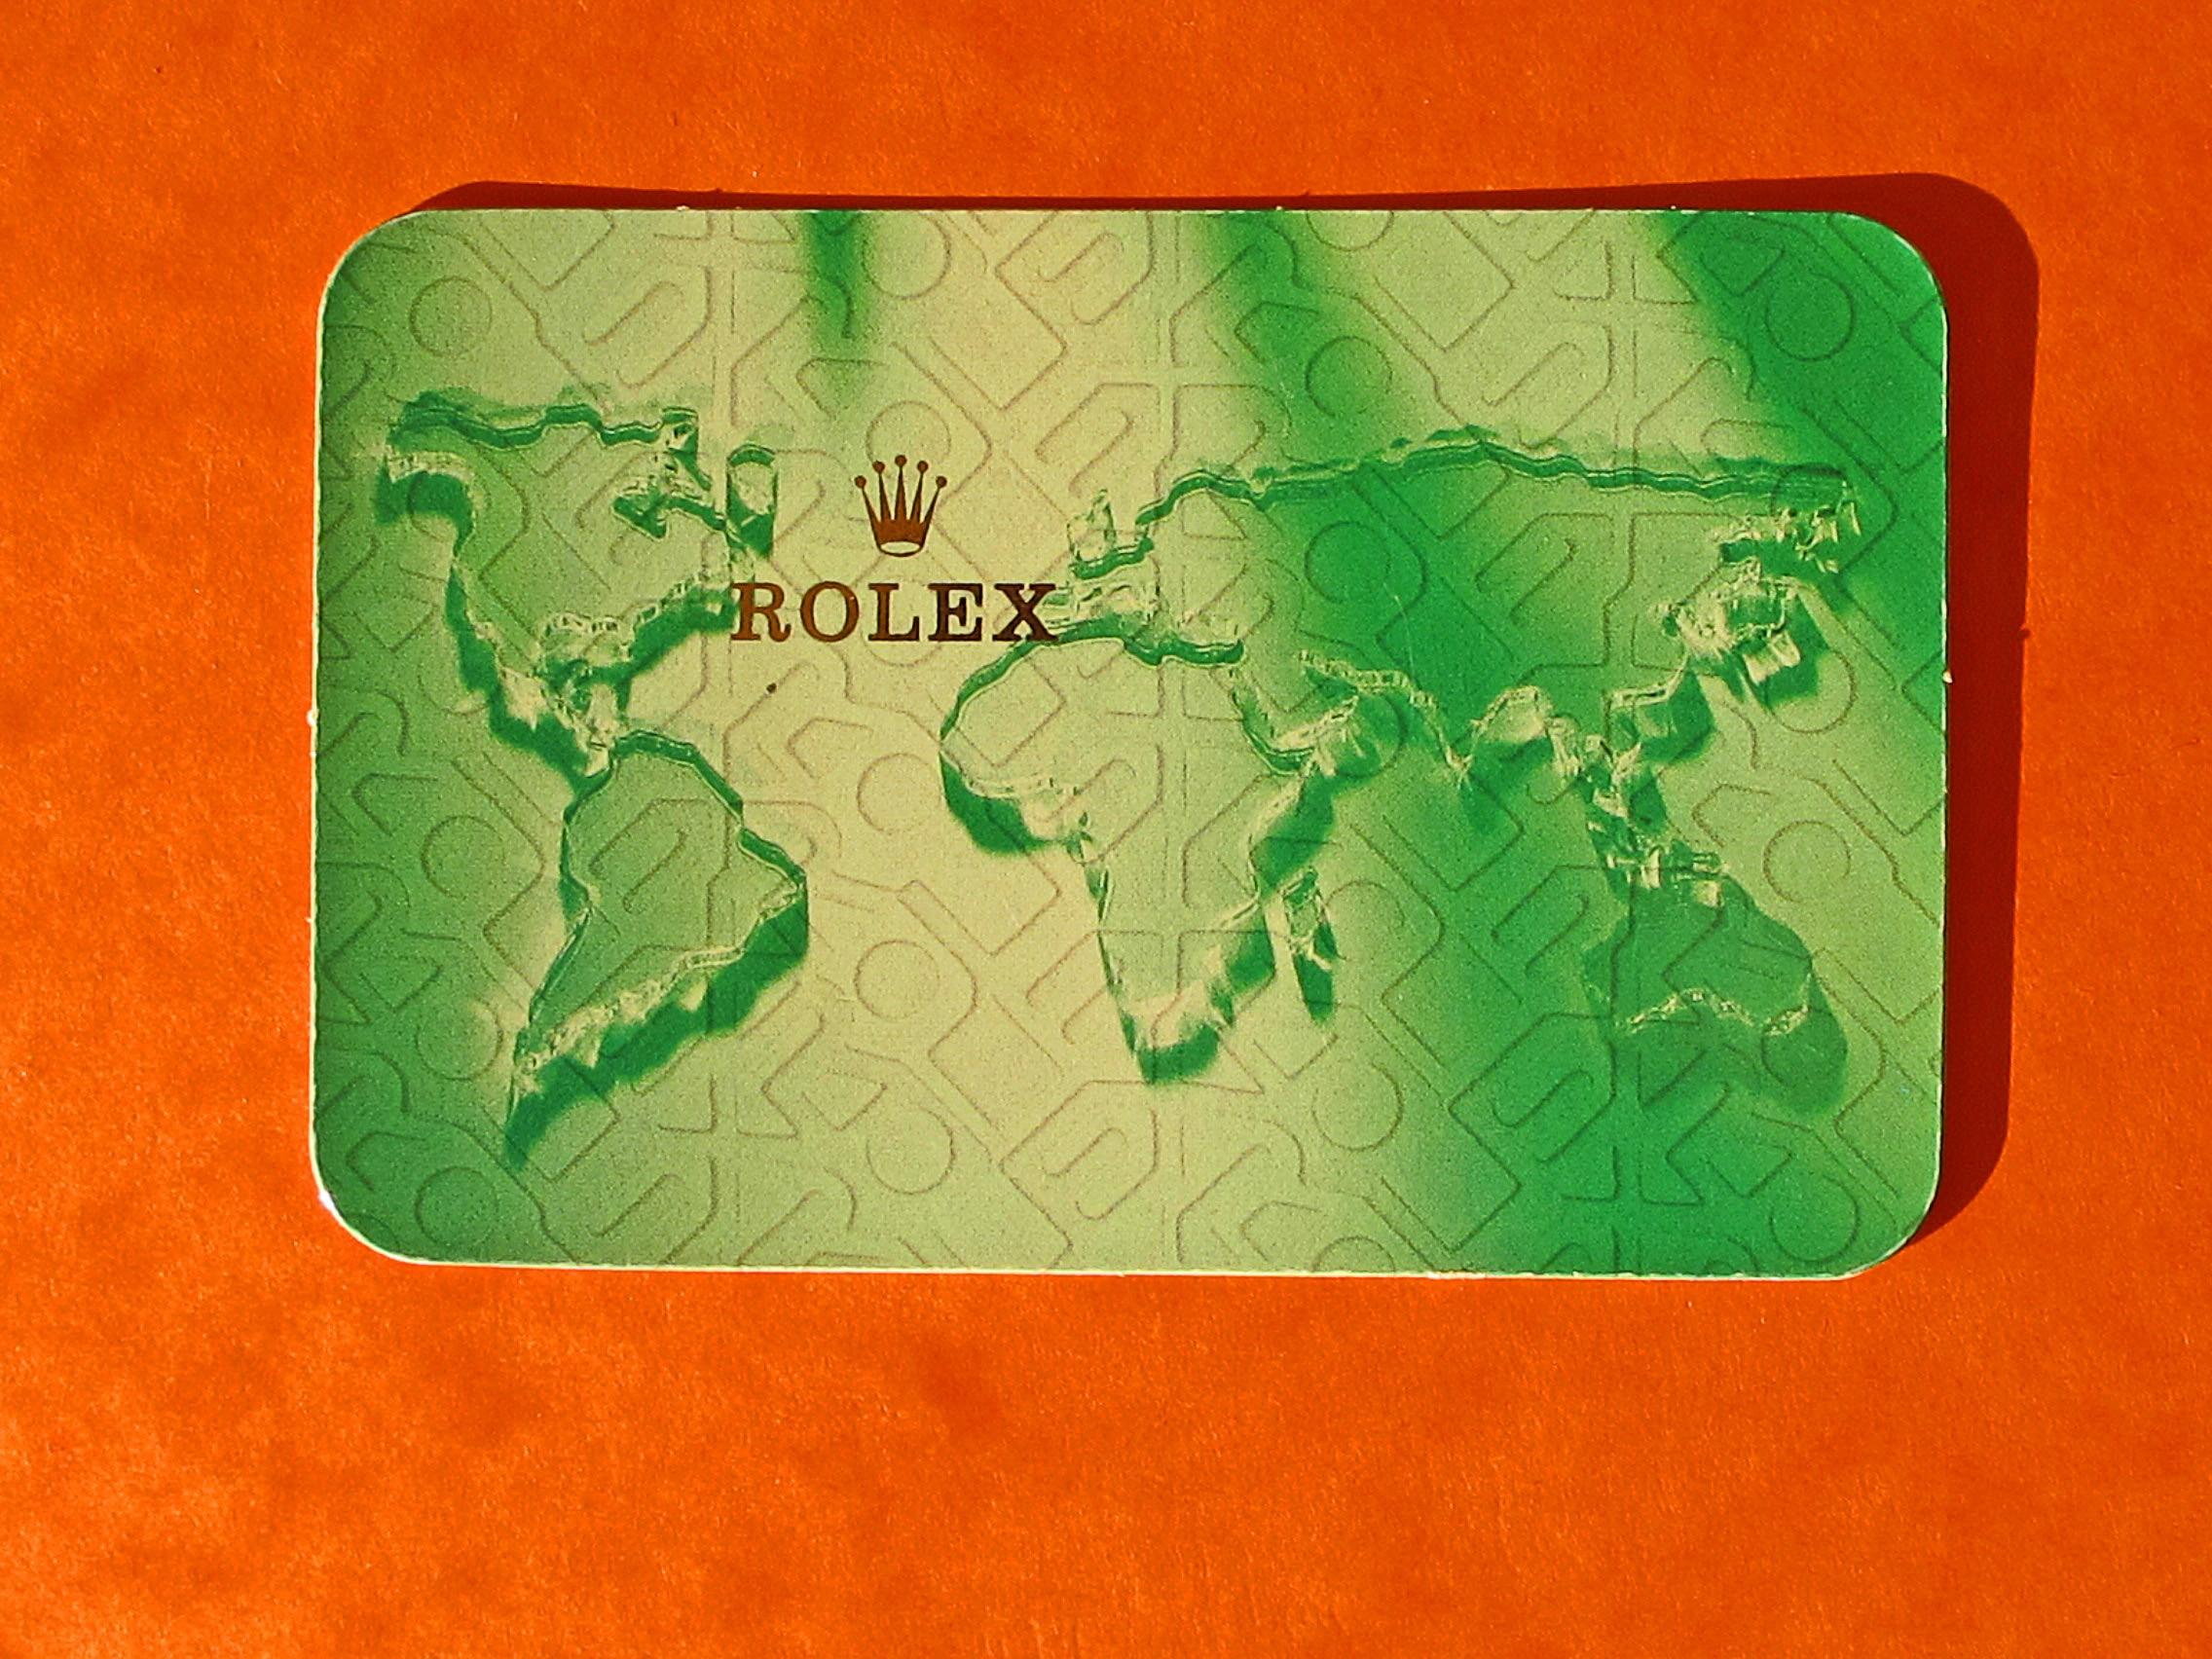 CALENDRIER ROLEX 2001-2002